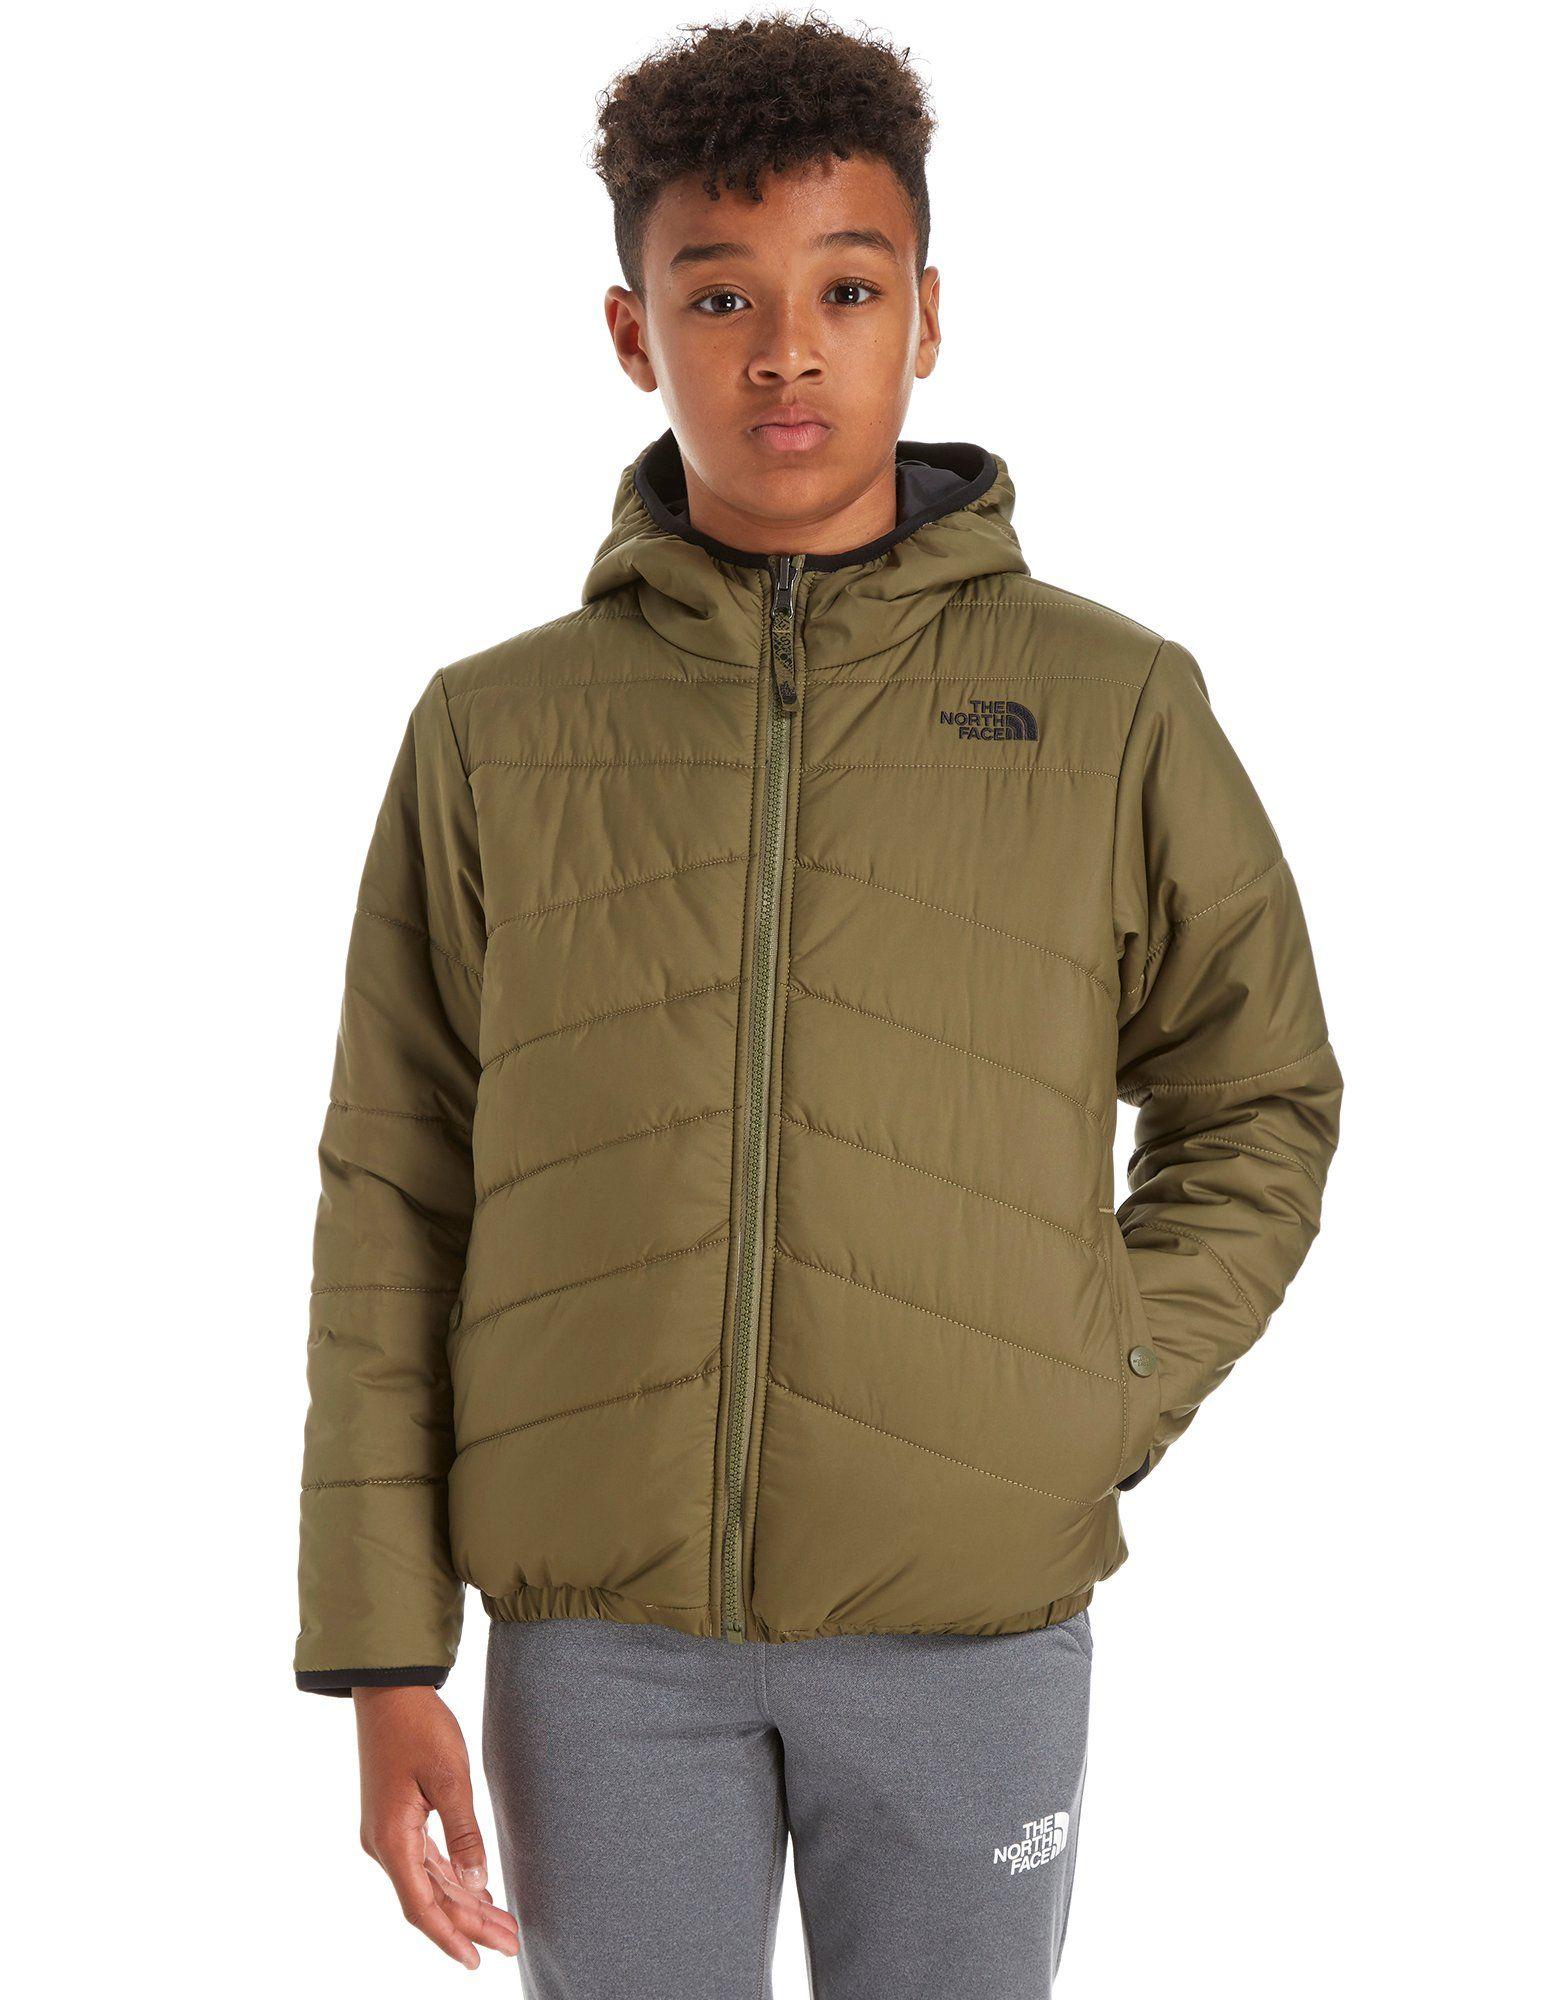 c89348549 The North Face Perrito Reversible Jacket Junior